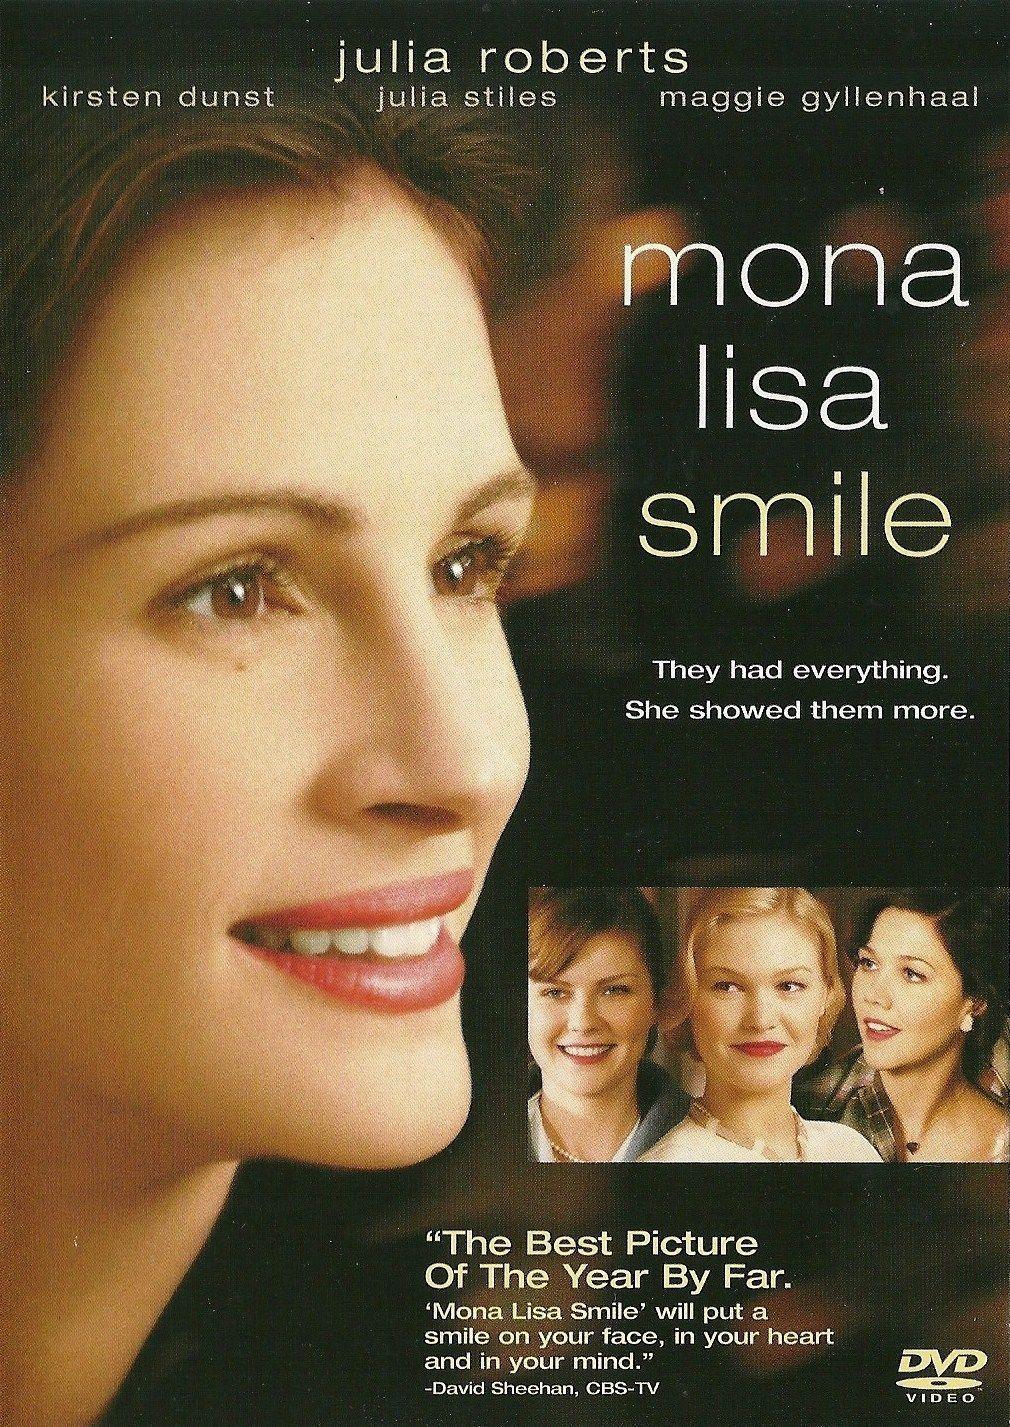 MONA LISA SMILE * Happy Birthday to: Laura Allen March 21 * Maggie  Gyllenhaal November 16